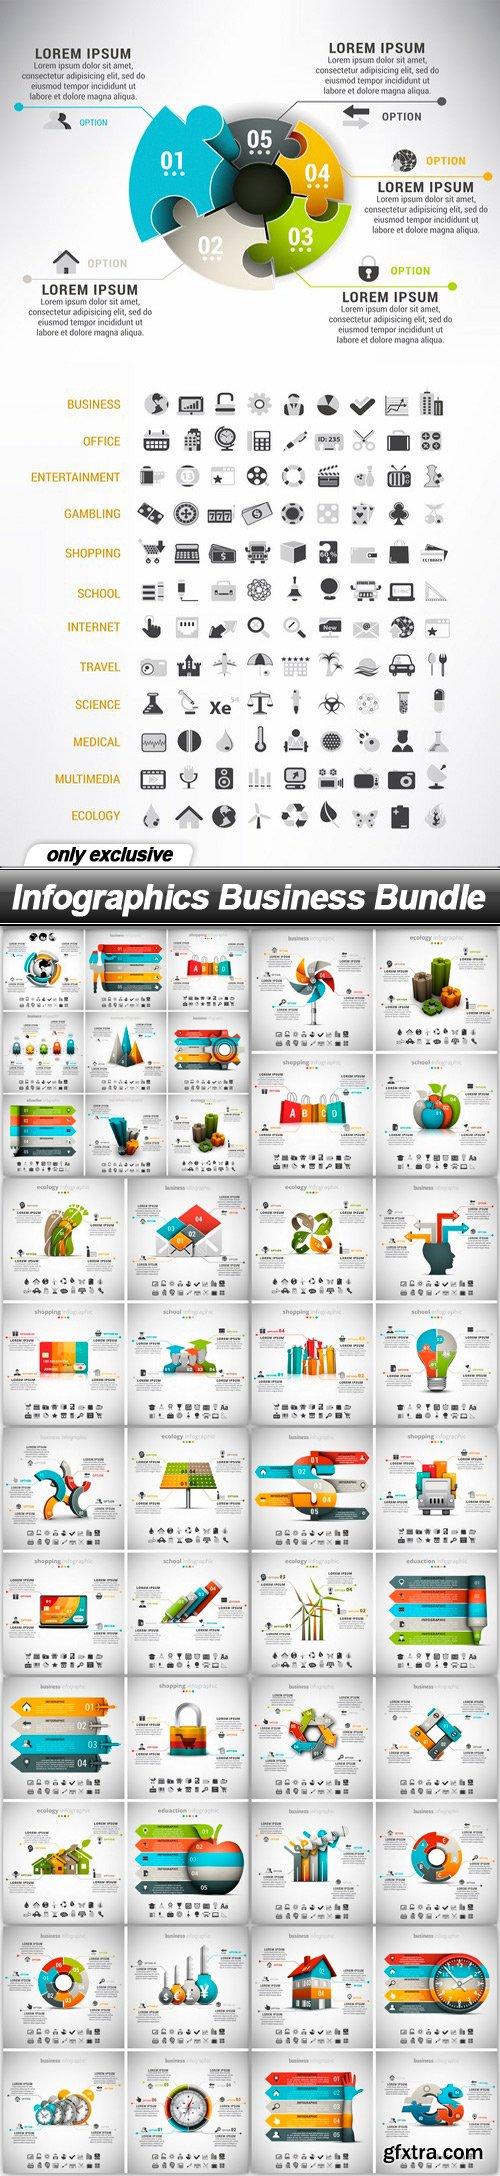 Infographics Business Bundle - 11 EPS